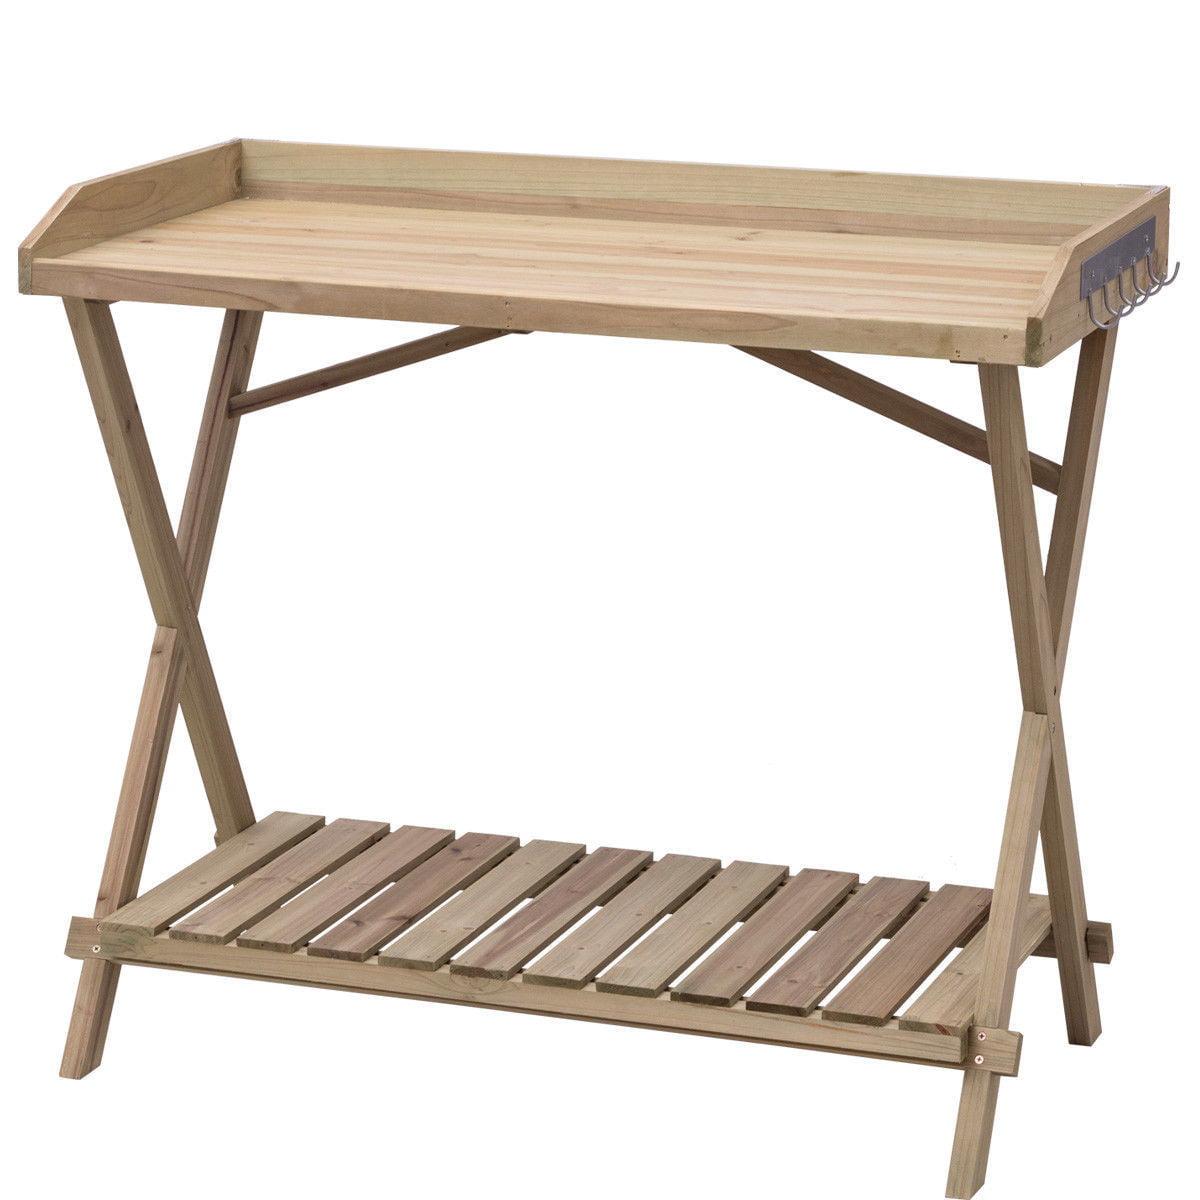 "GHP 40""x21""x35"" Fir Wood Top Workspace Side Hooks & Slatted Bottom Potting Bench"